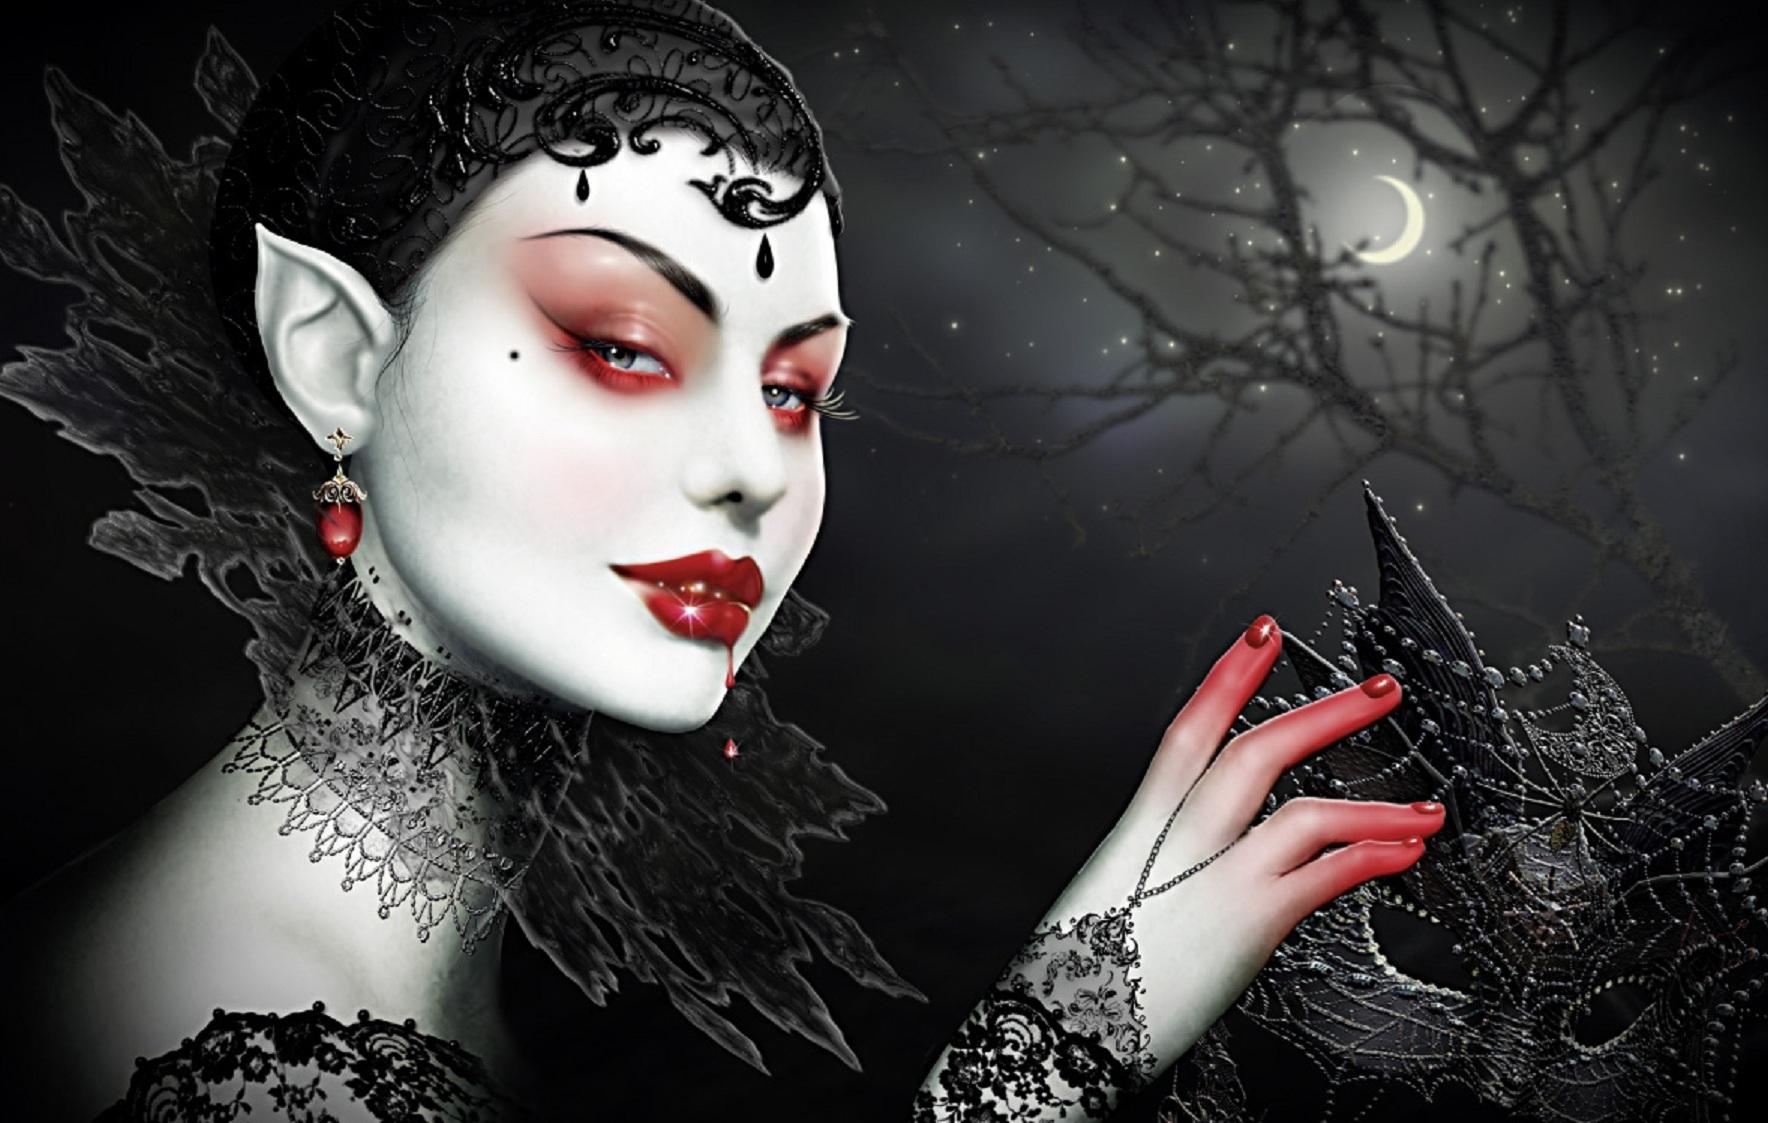 Vampire wallpaper and background image 1768x1123 id - Wallpaper vampire anime ...